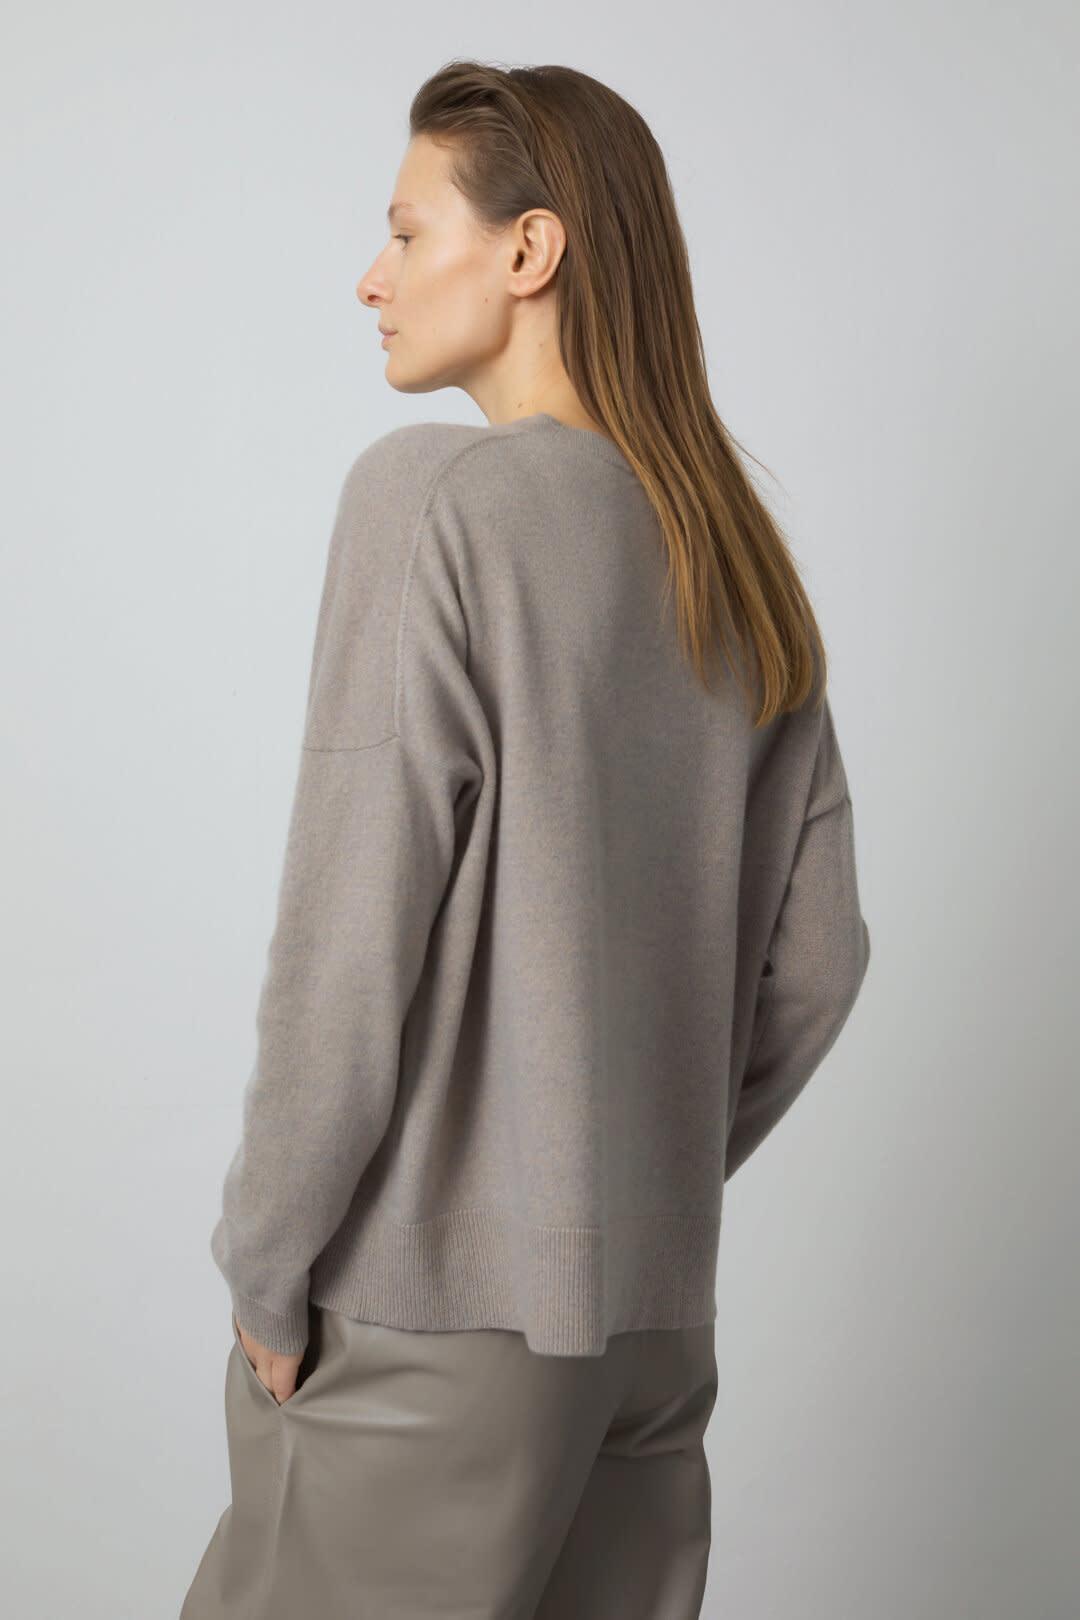 Cashmere Sweater - Muddy Beige-2